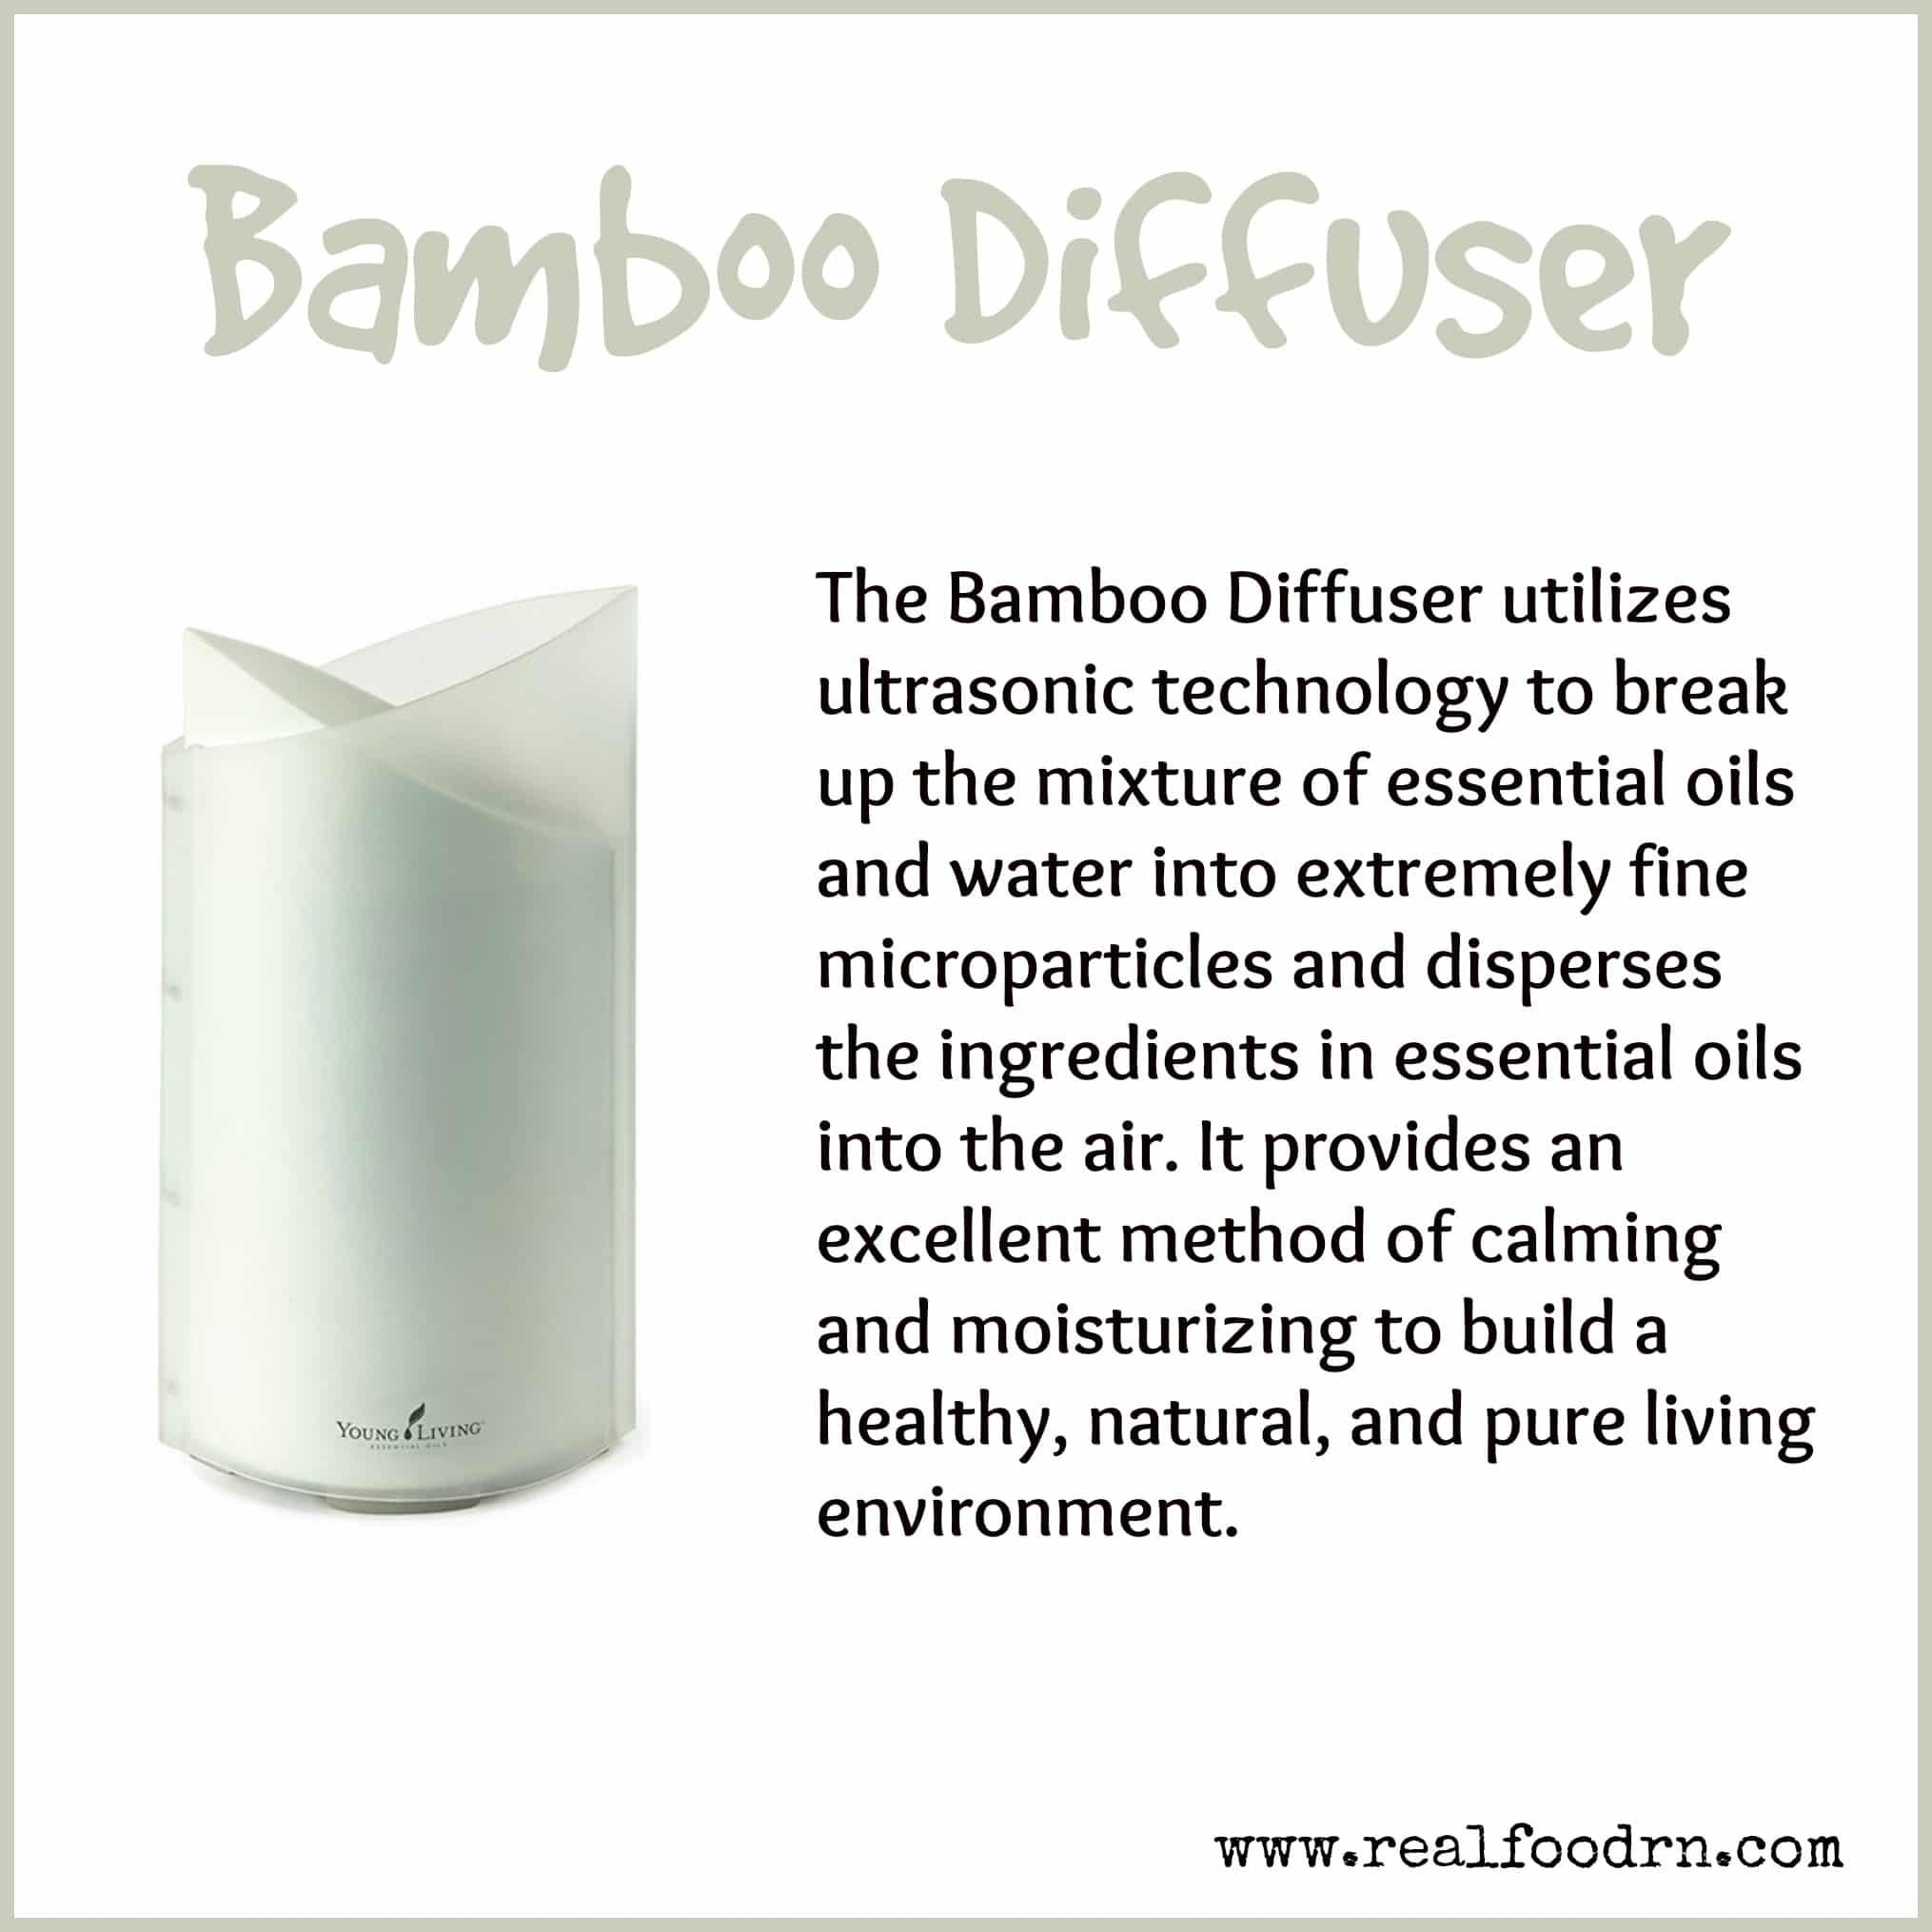 Bamboo Diffuser